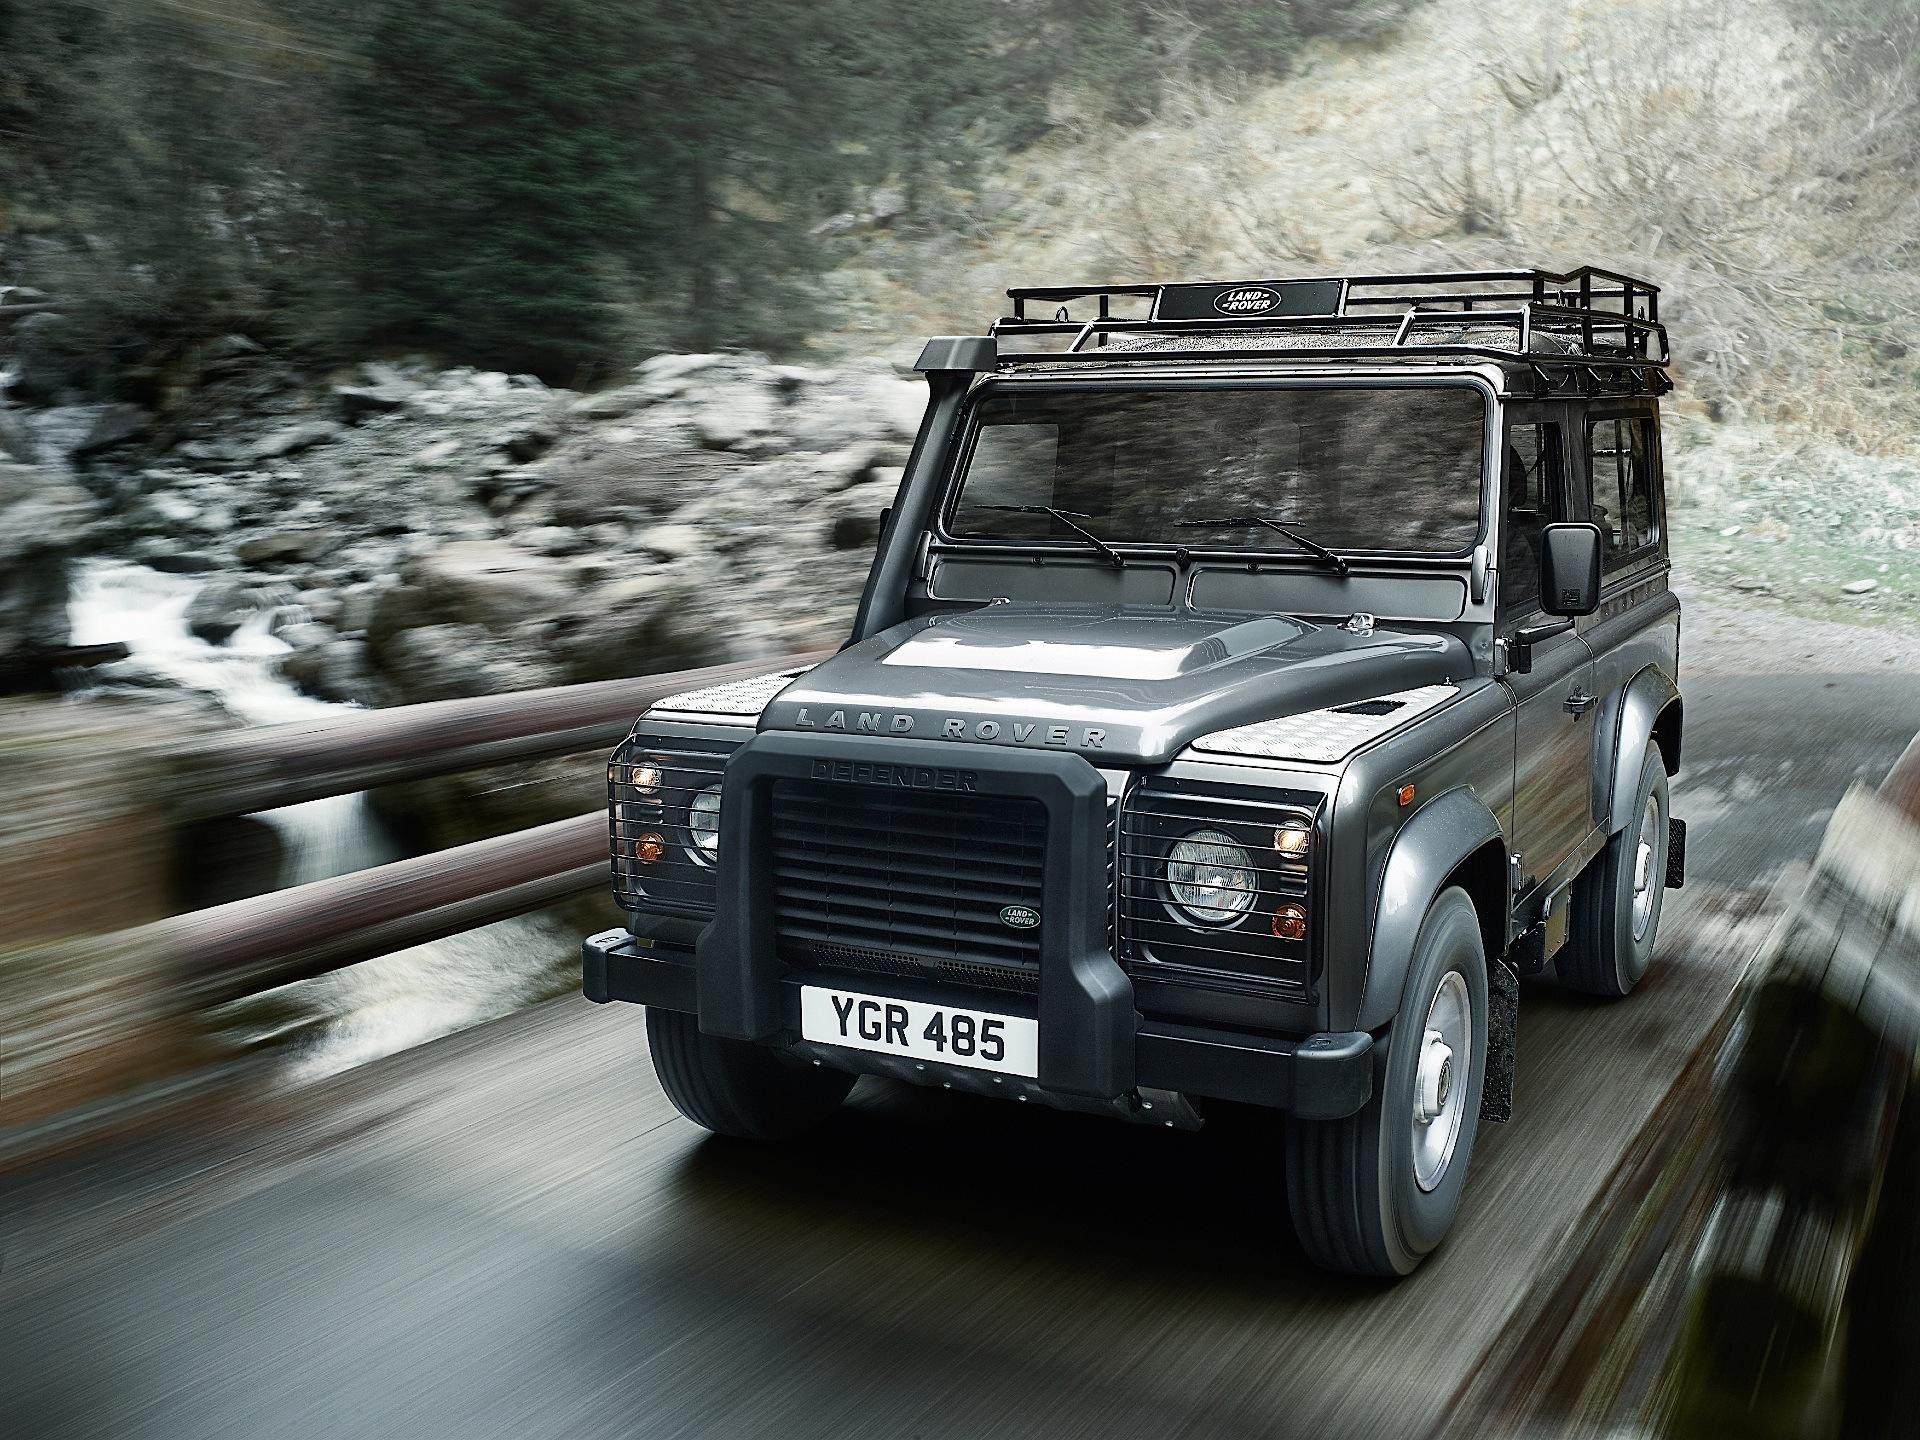 Land Rover Defender 2014 >> LAND ROVER Defender 90 - 2012, 2013, 2014, 2015, 2016 - autoevolution